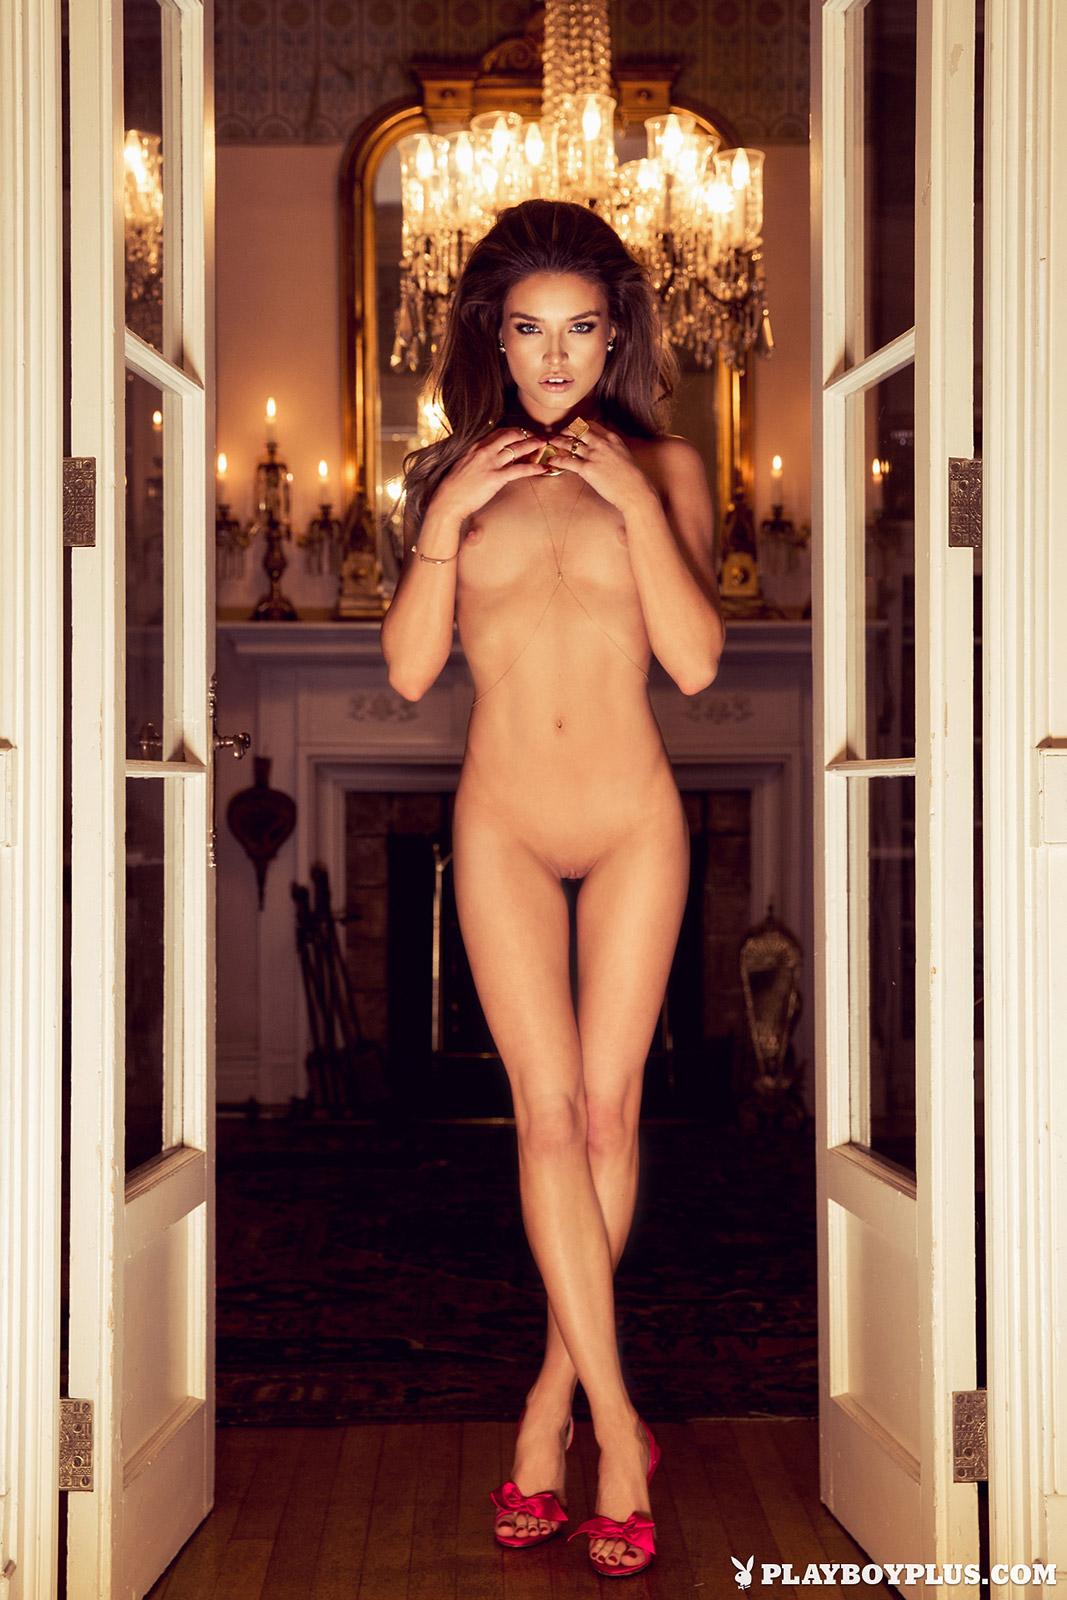 Miranda kerr's latest naked pictures